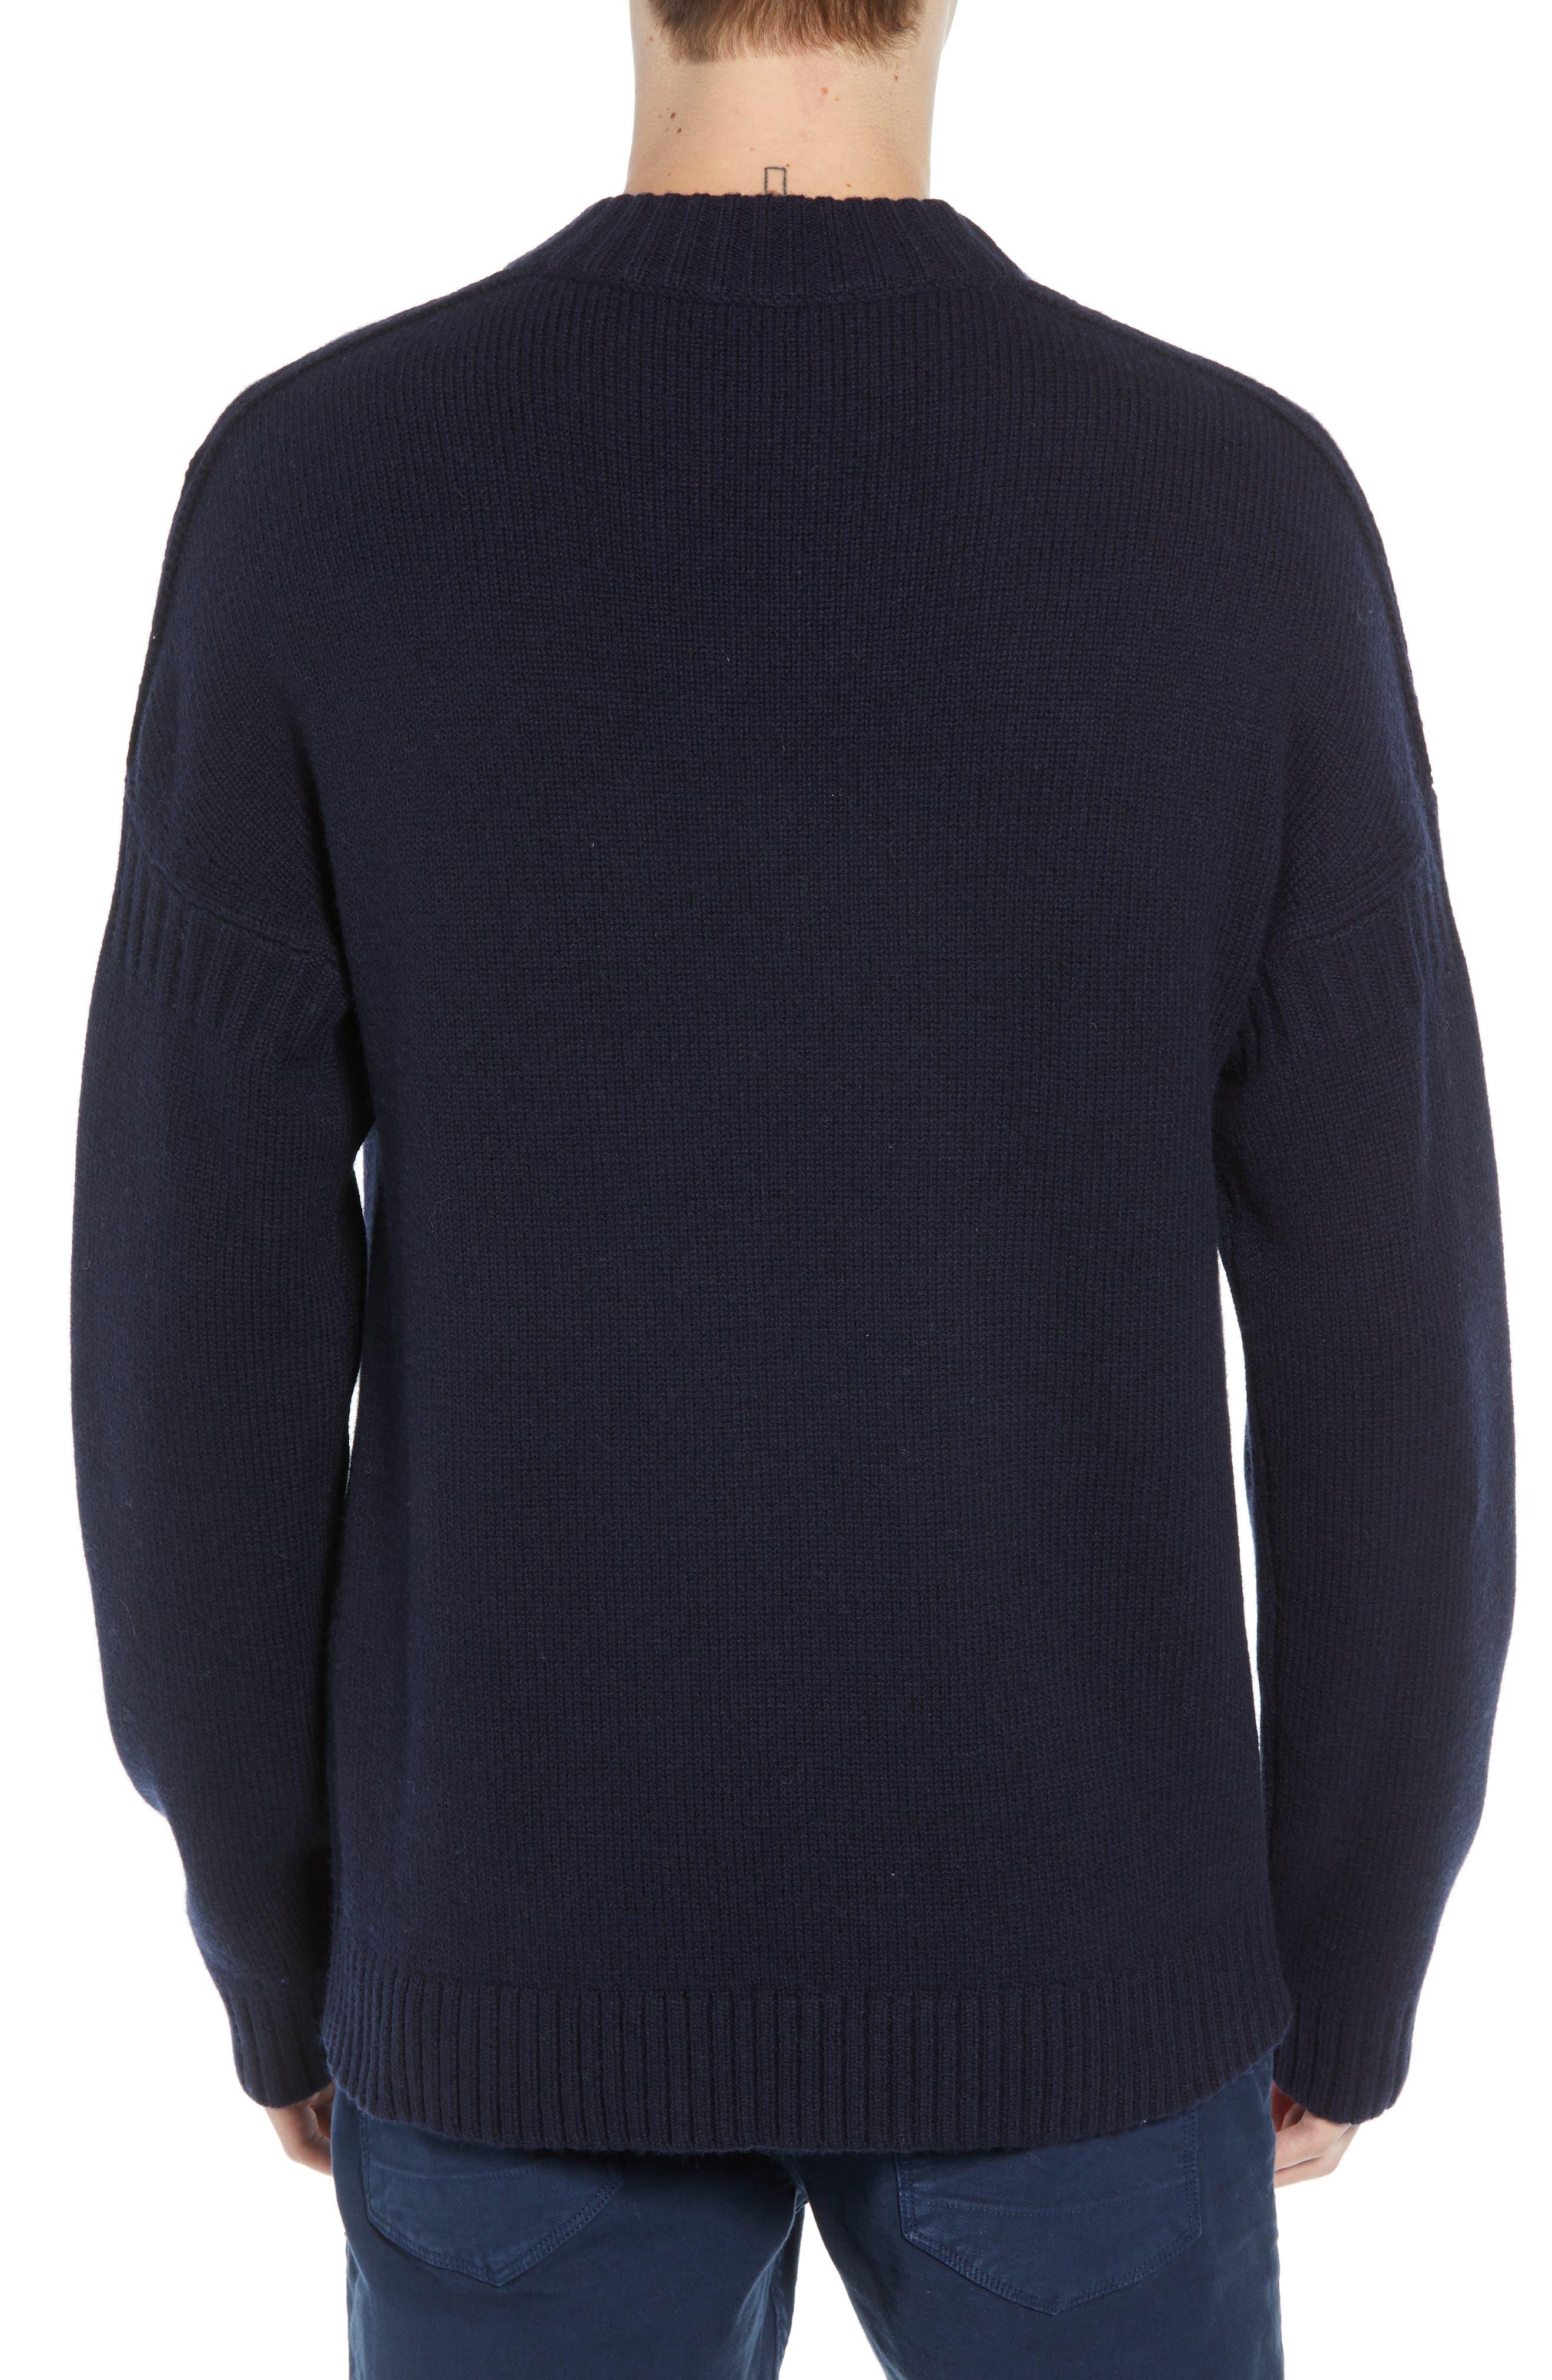 Fisherman Wool Blend Crewneck Sweater,                             Alternate thumbnail 2, color,                             UTILITY BLUE